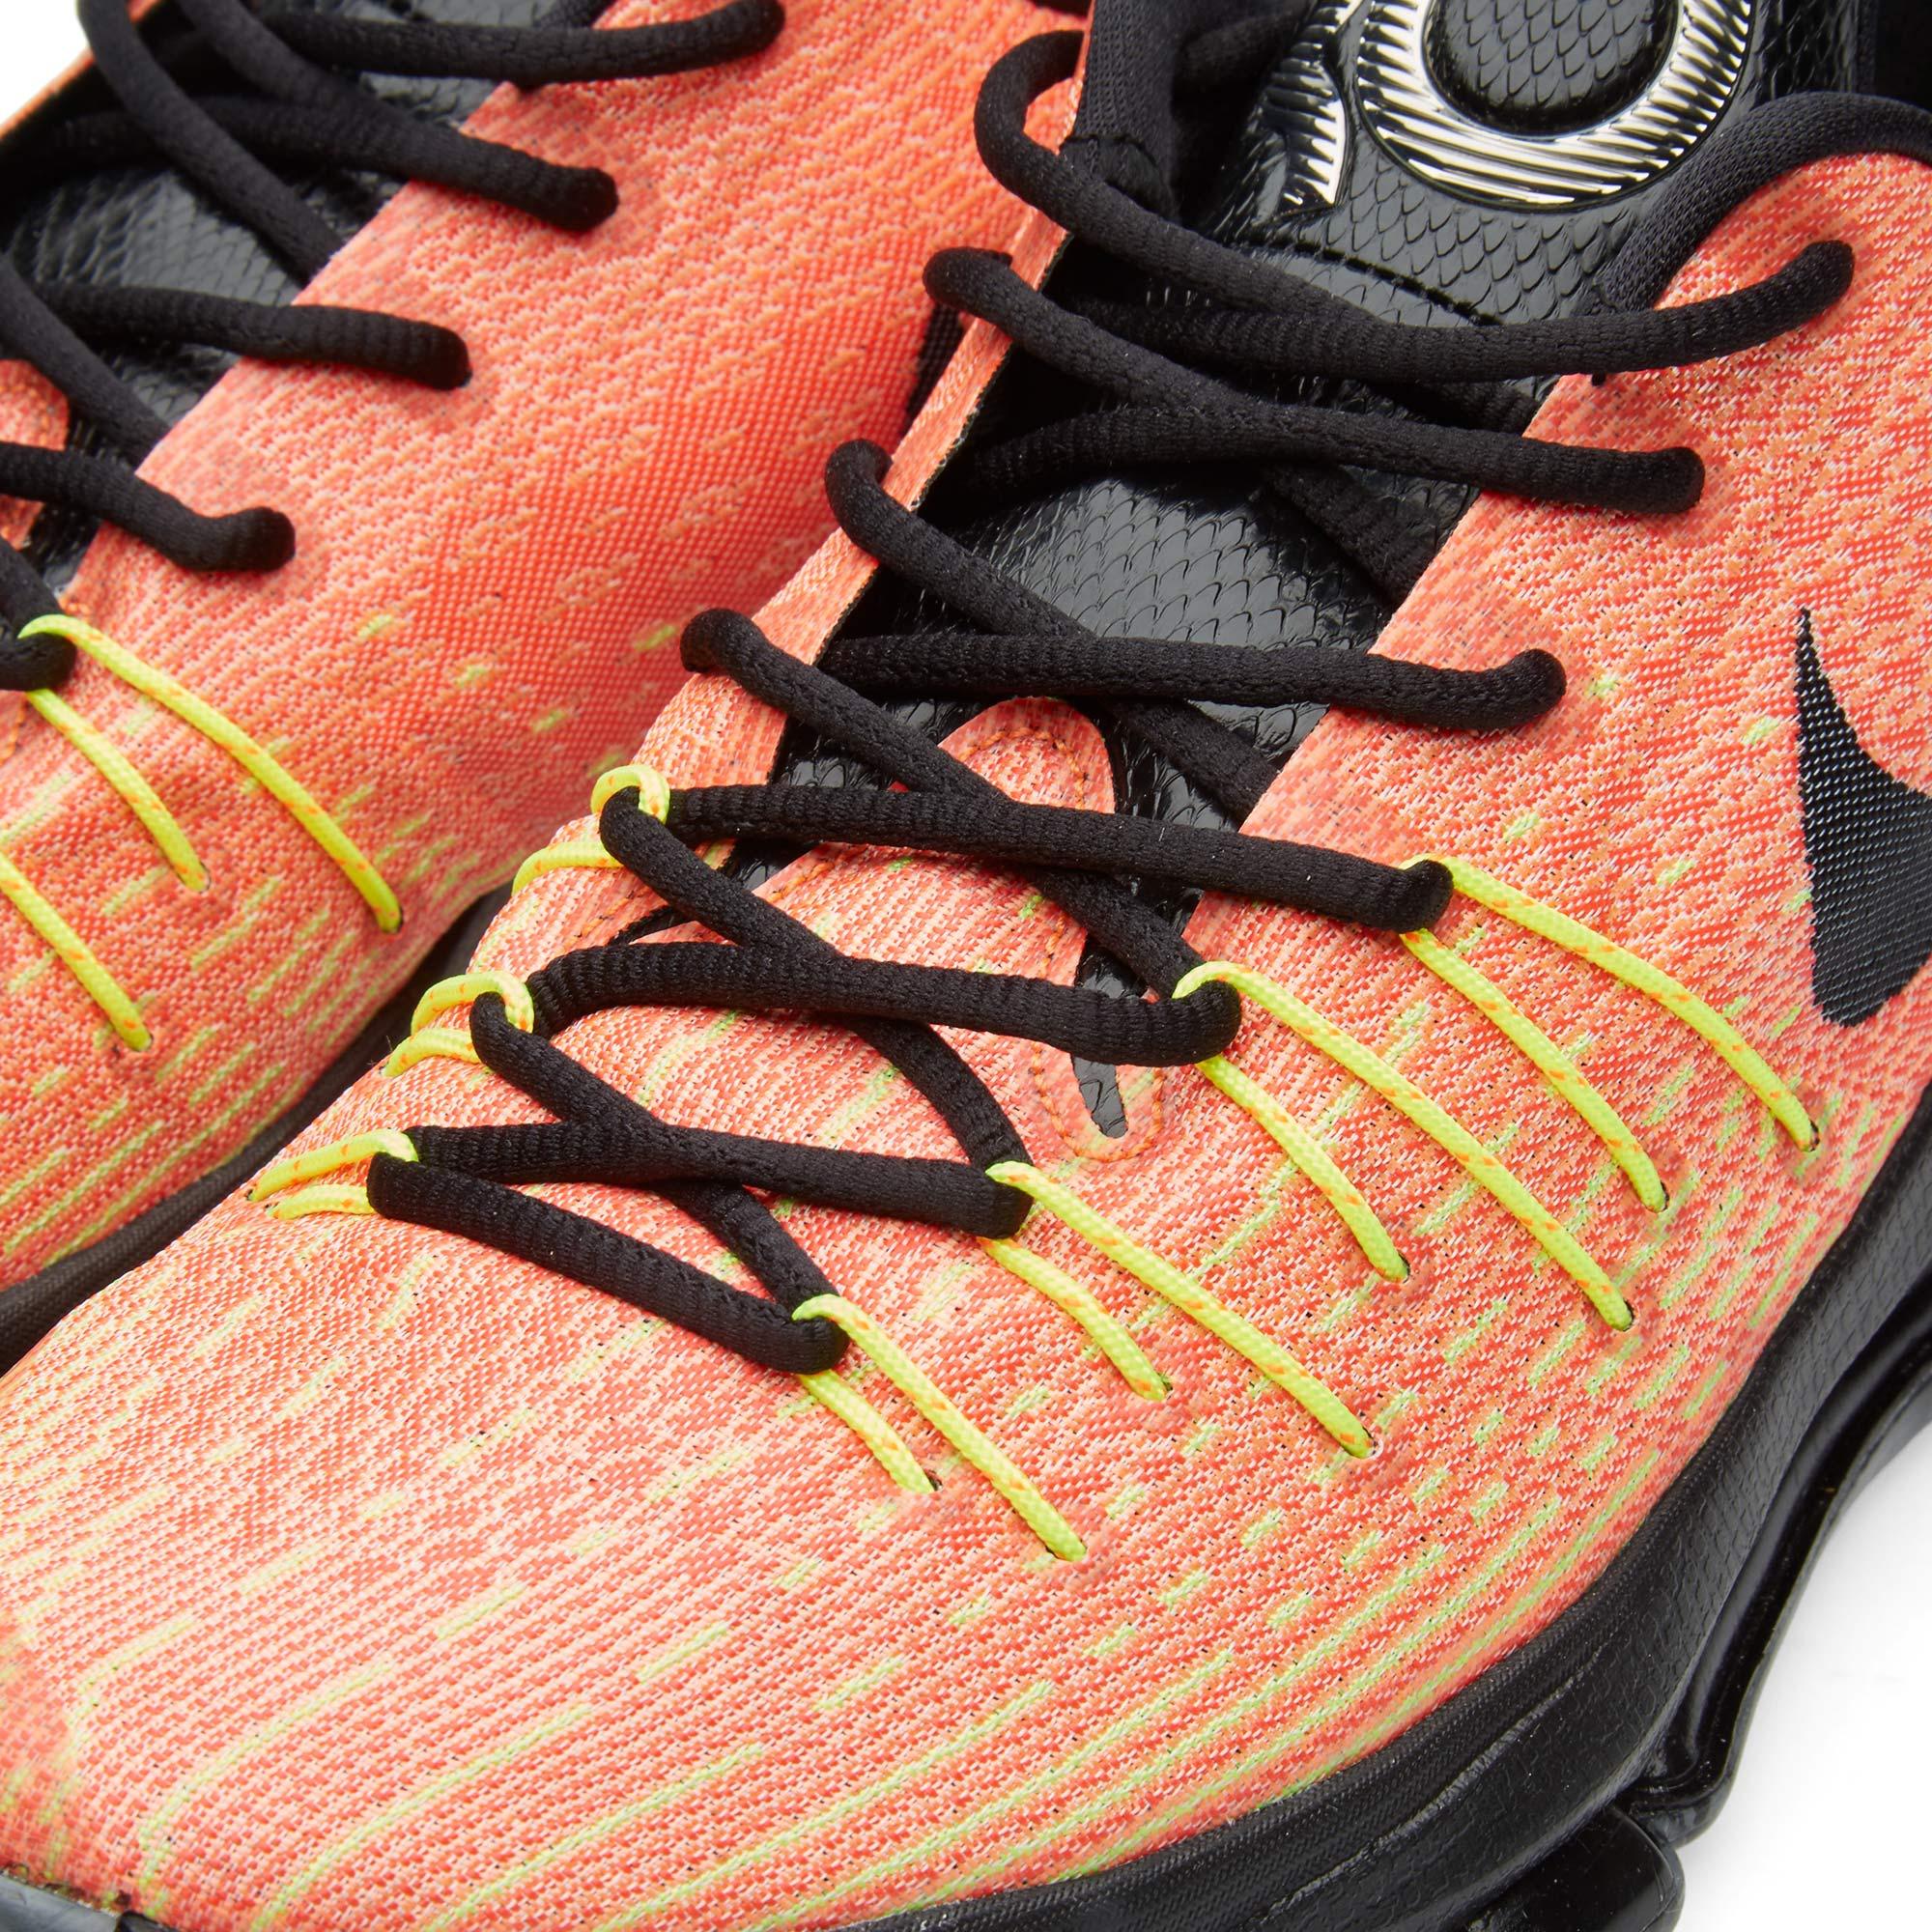 9c802137d7c2 Nike KD 8  Hunt s Hill Sunrise  Total Orange   Black